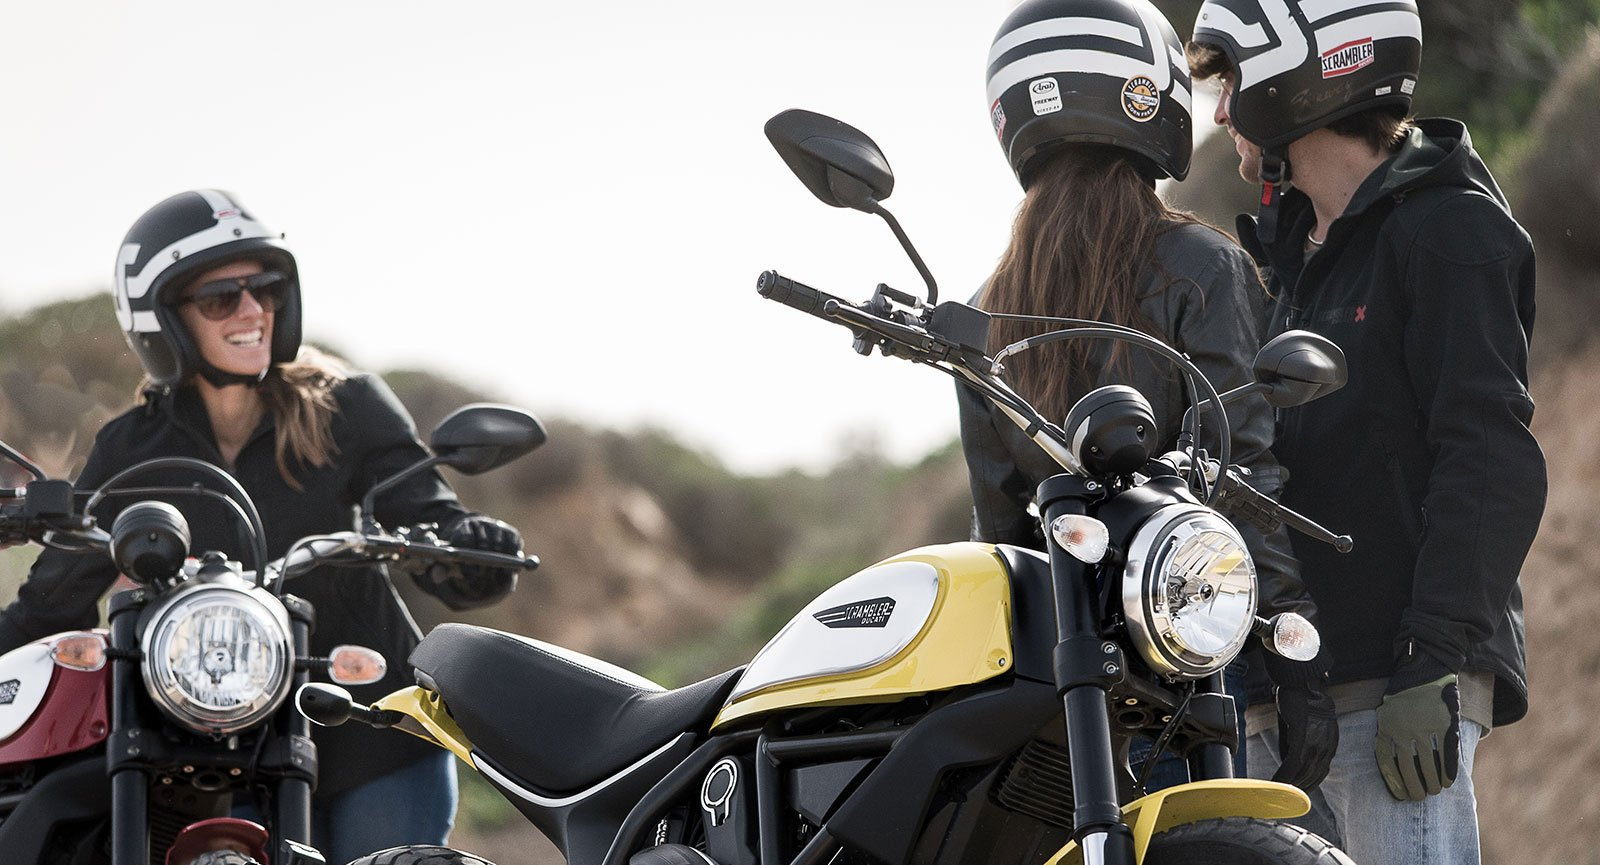 Nueva Ducati Scrambler 2015. The Land of Joy 10